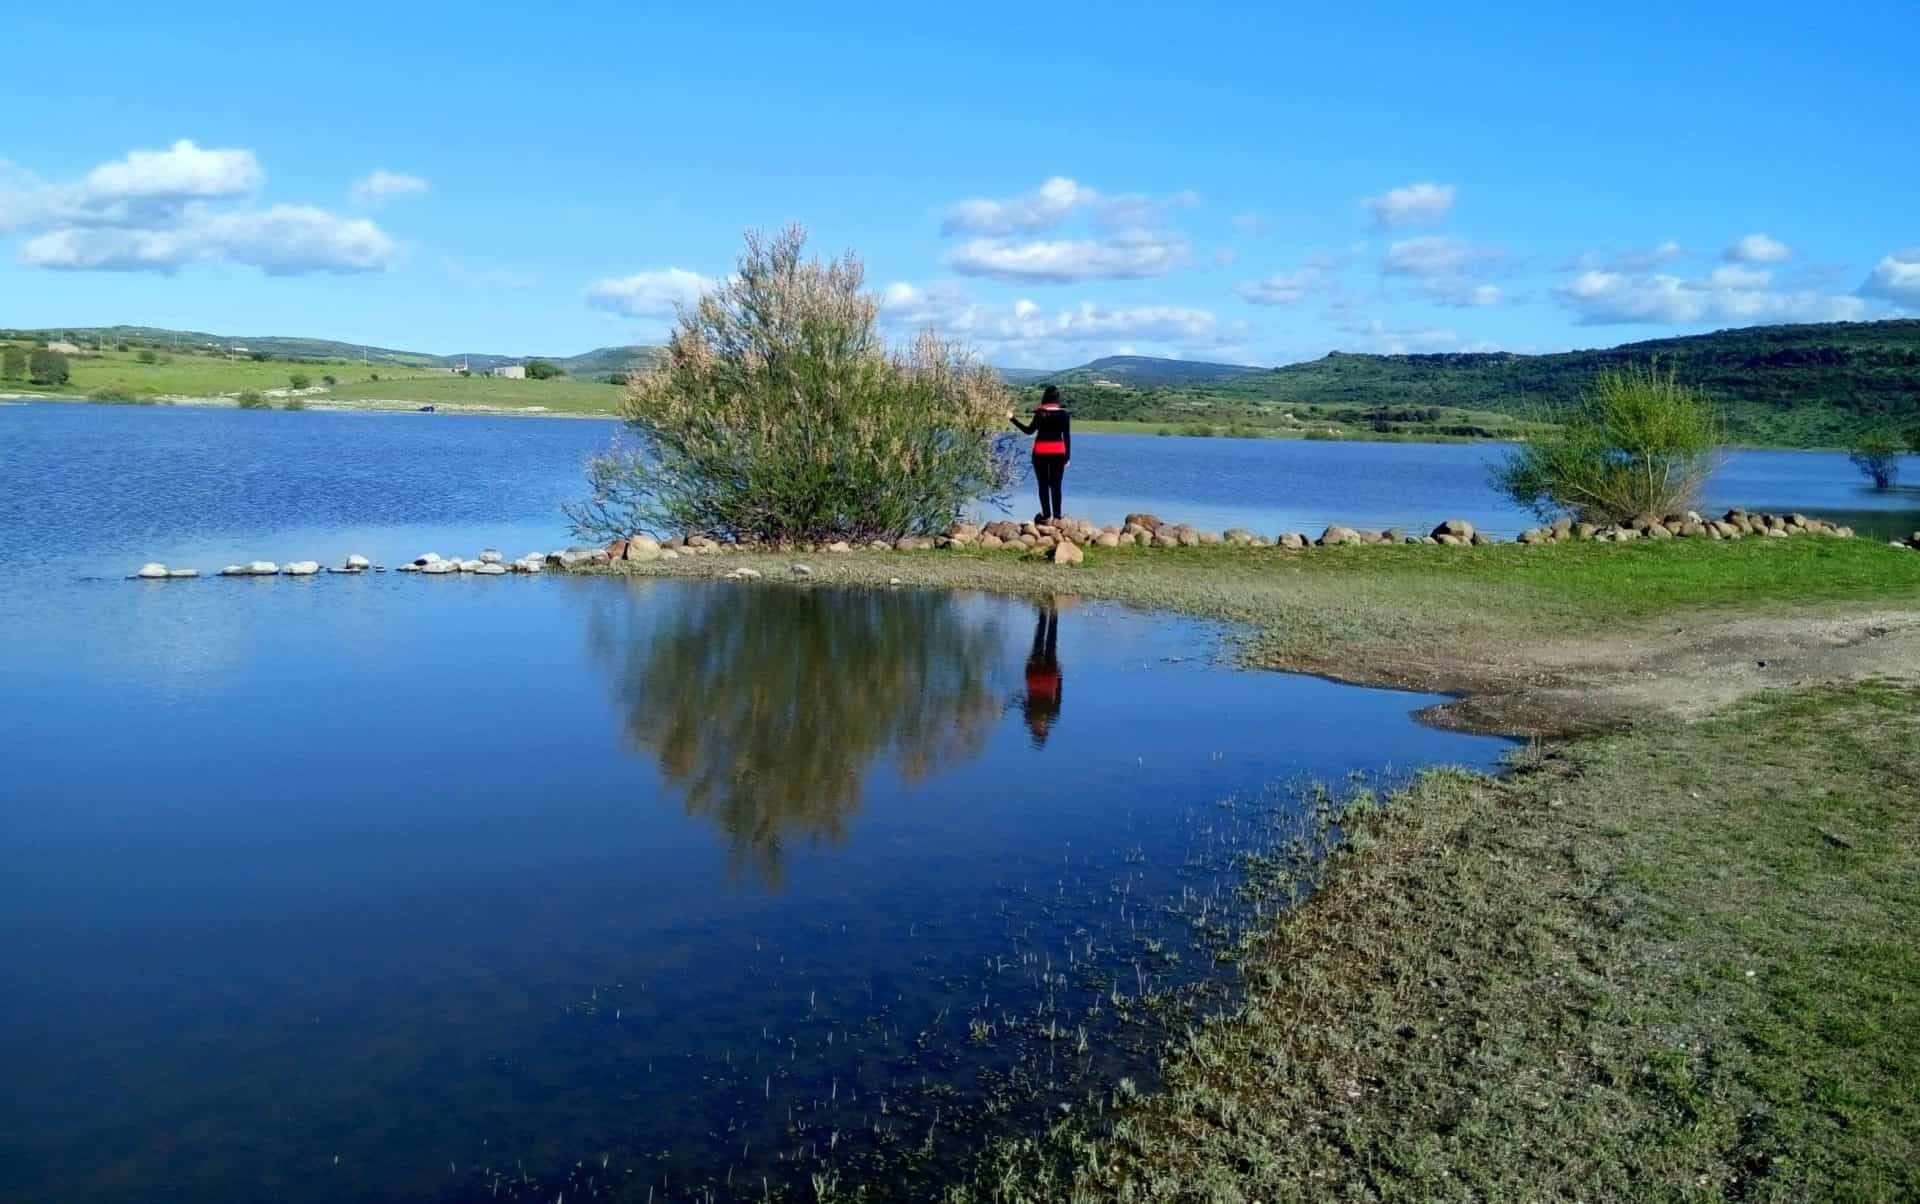 lago_cuga_panorama_stagno